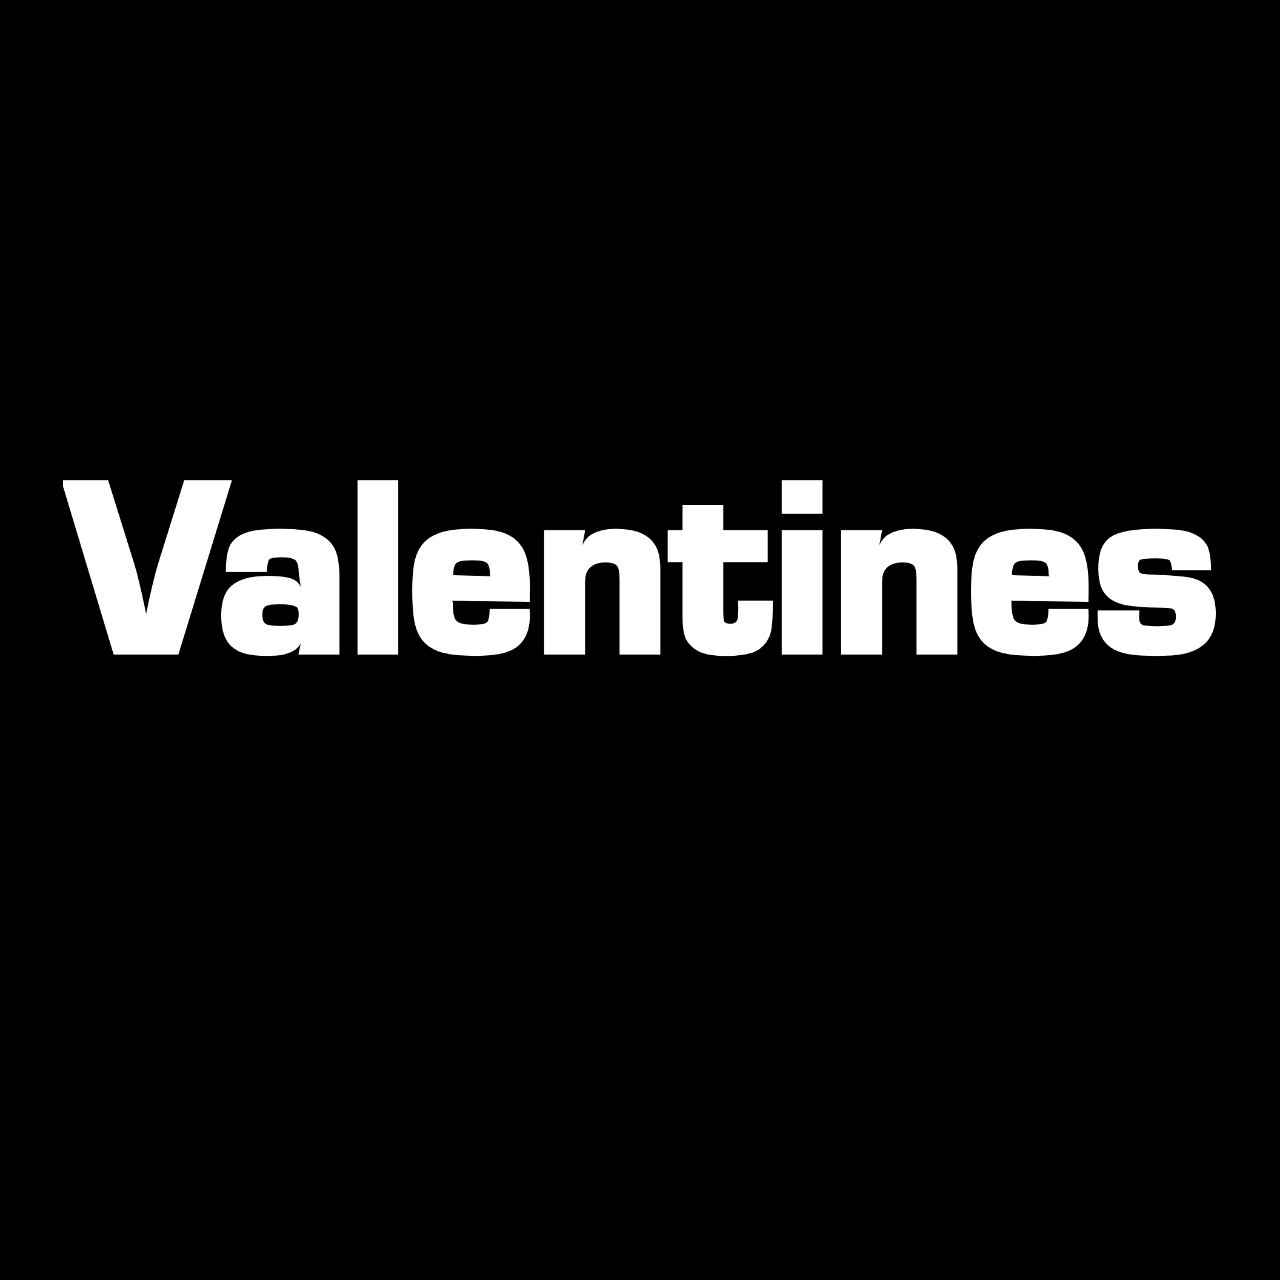 Valentines strok image